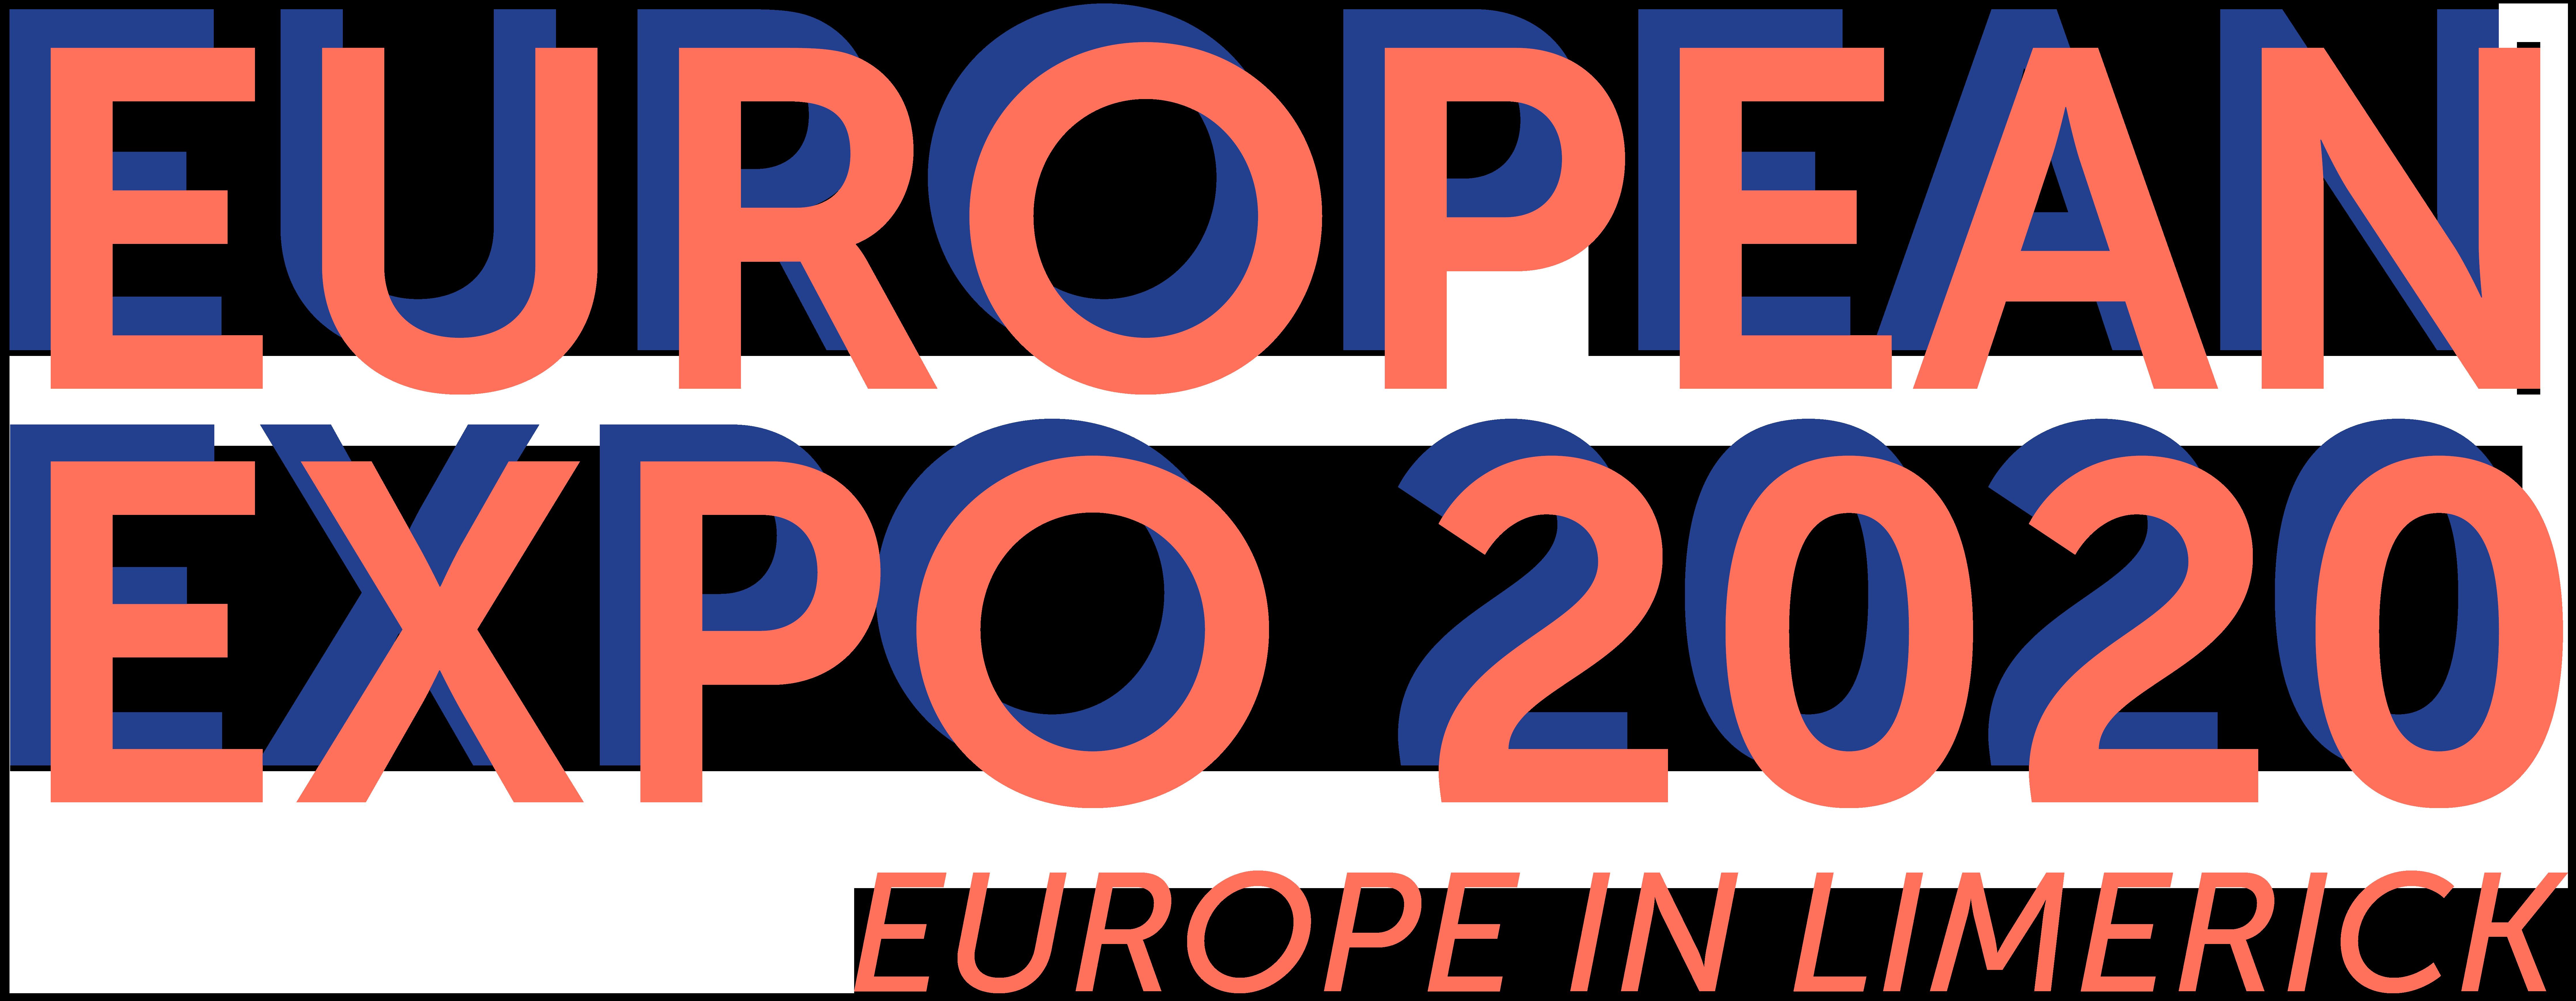 European Expo 2020